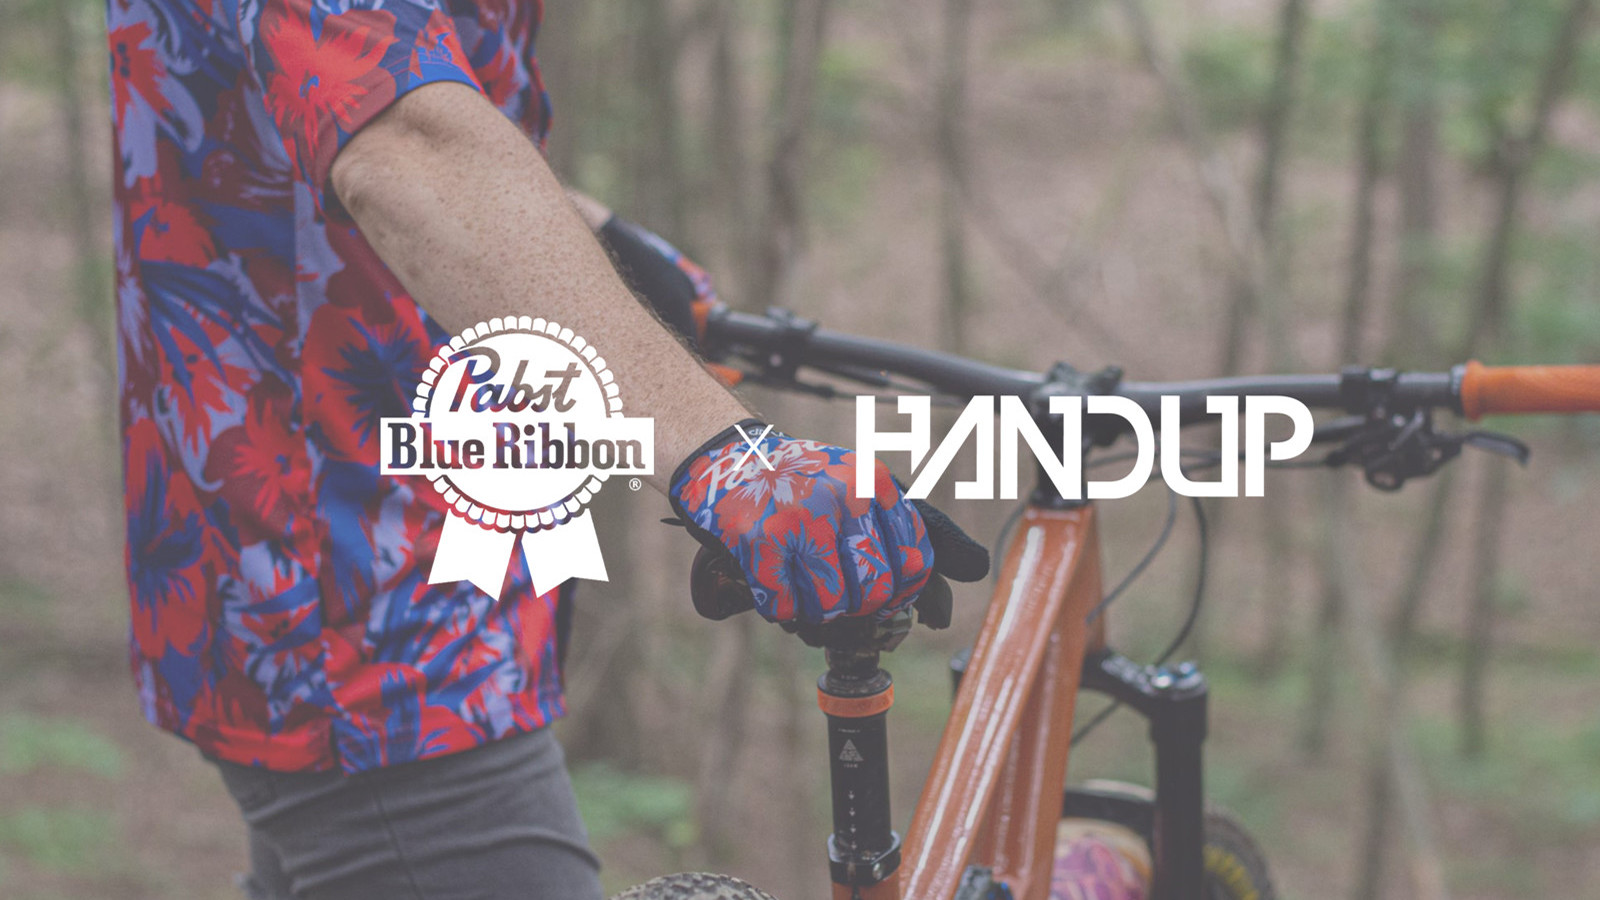 Handup Gloves Launches HANDUP X Pabst Blue Ribbon Collab Gear!